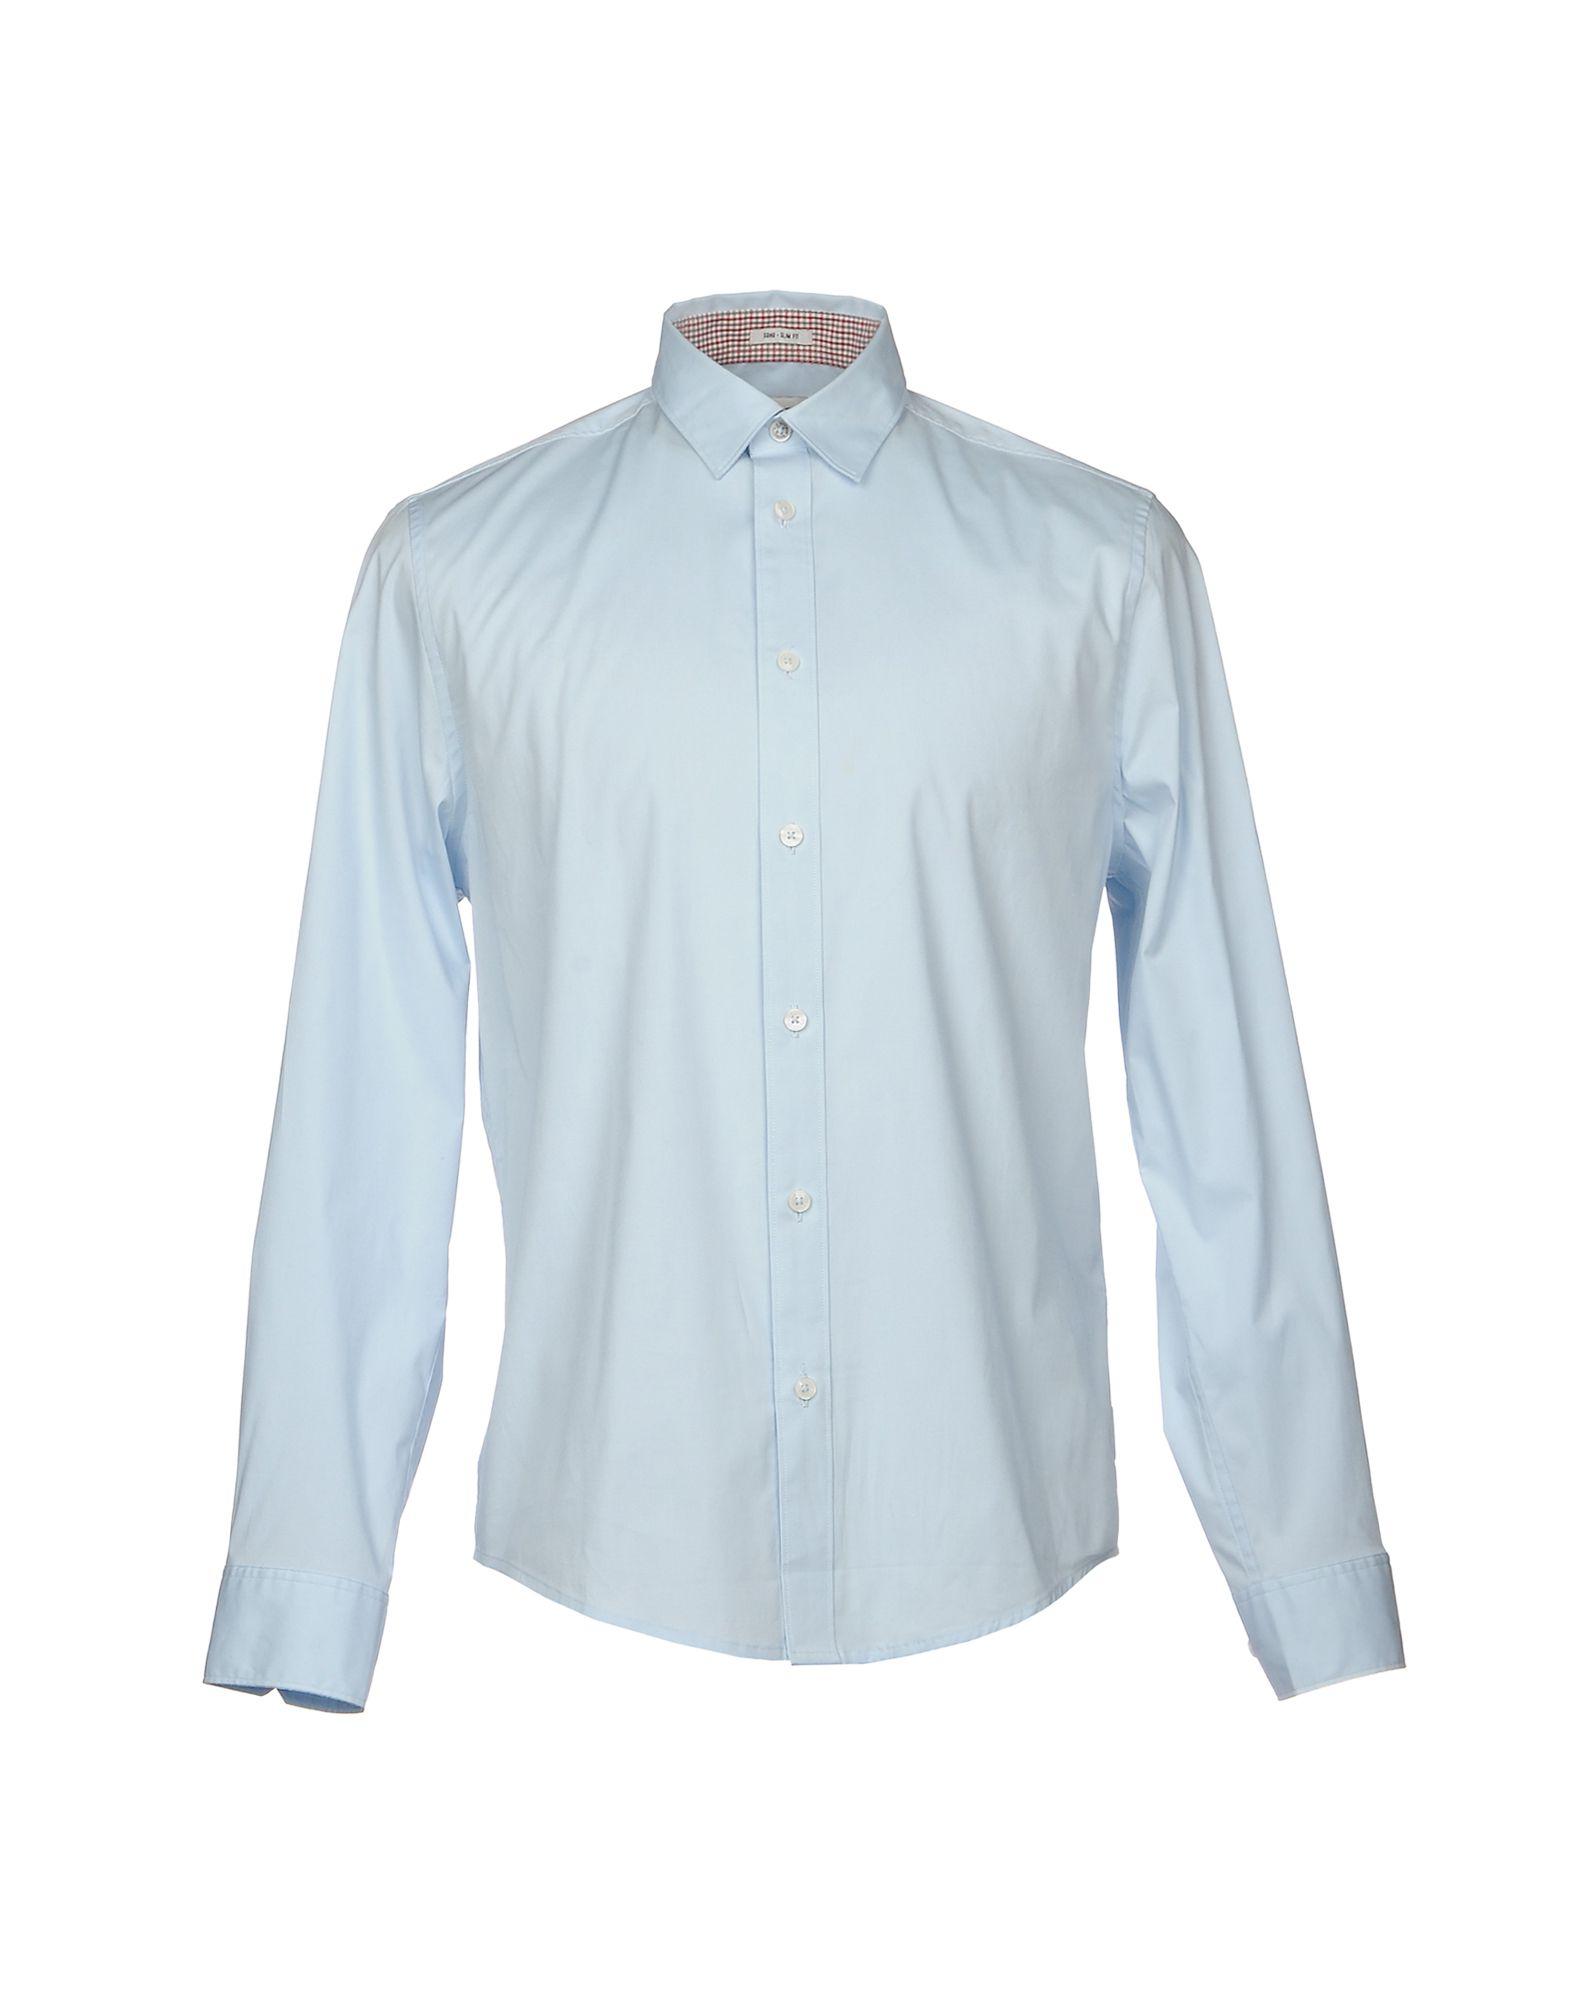 BEN SHERMAN Pубашка панели для кухни фартук в курске